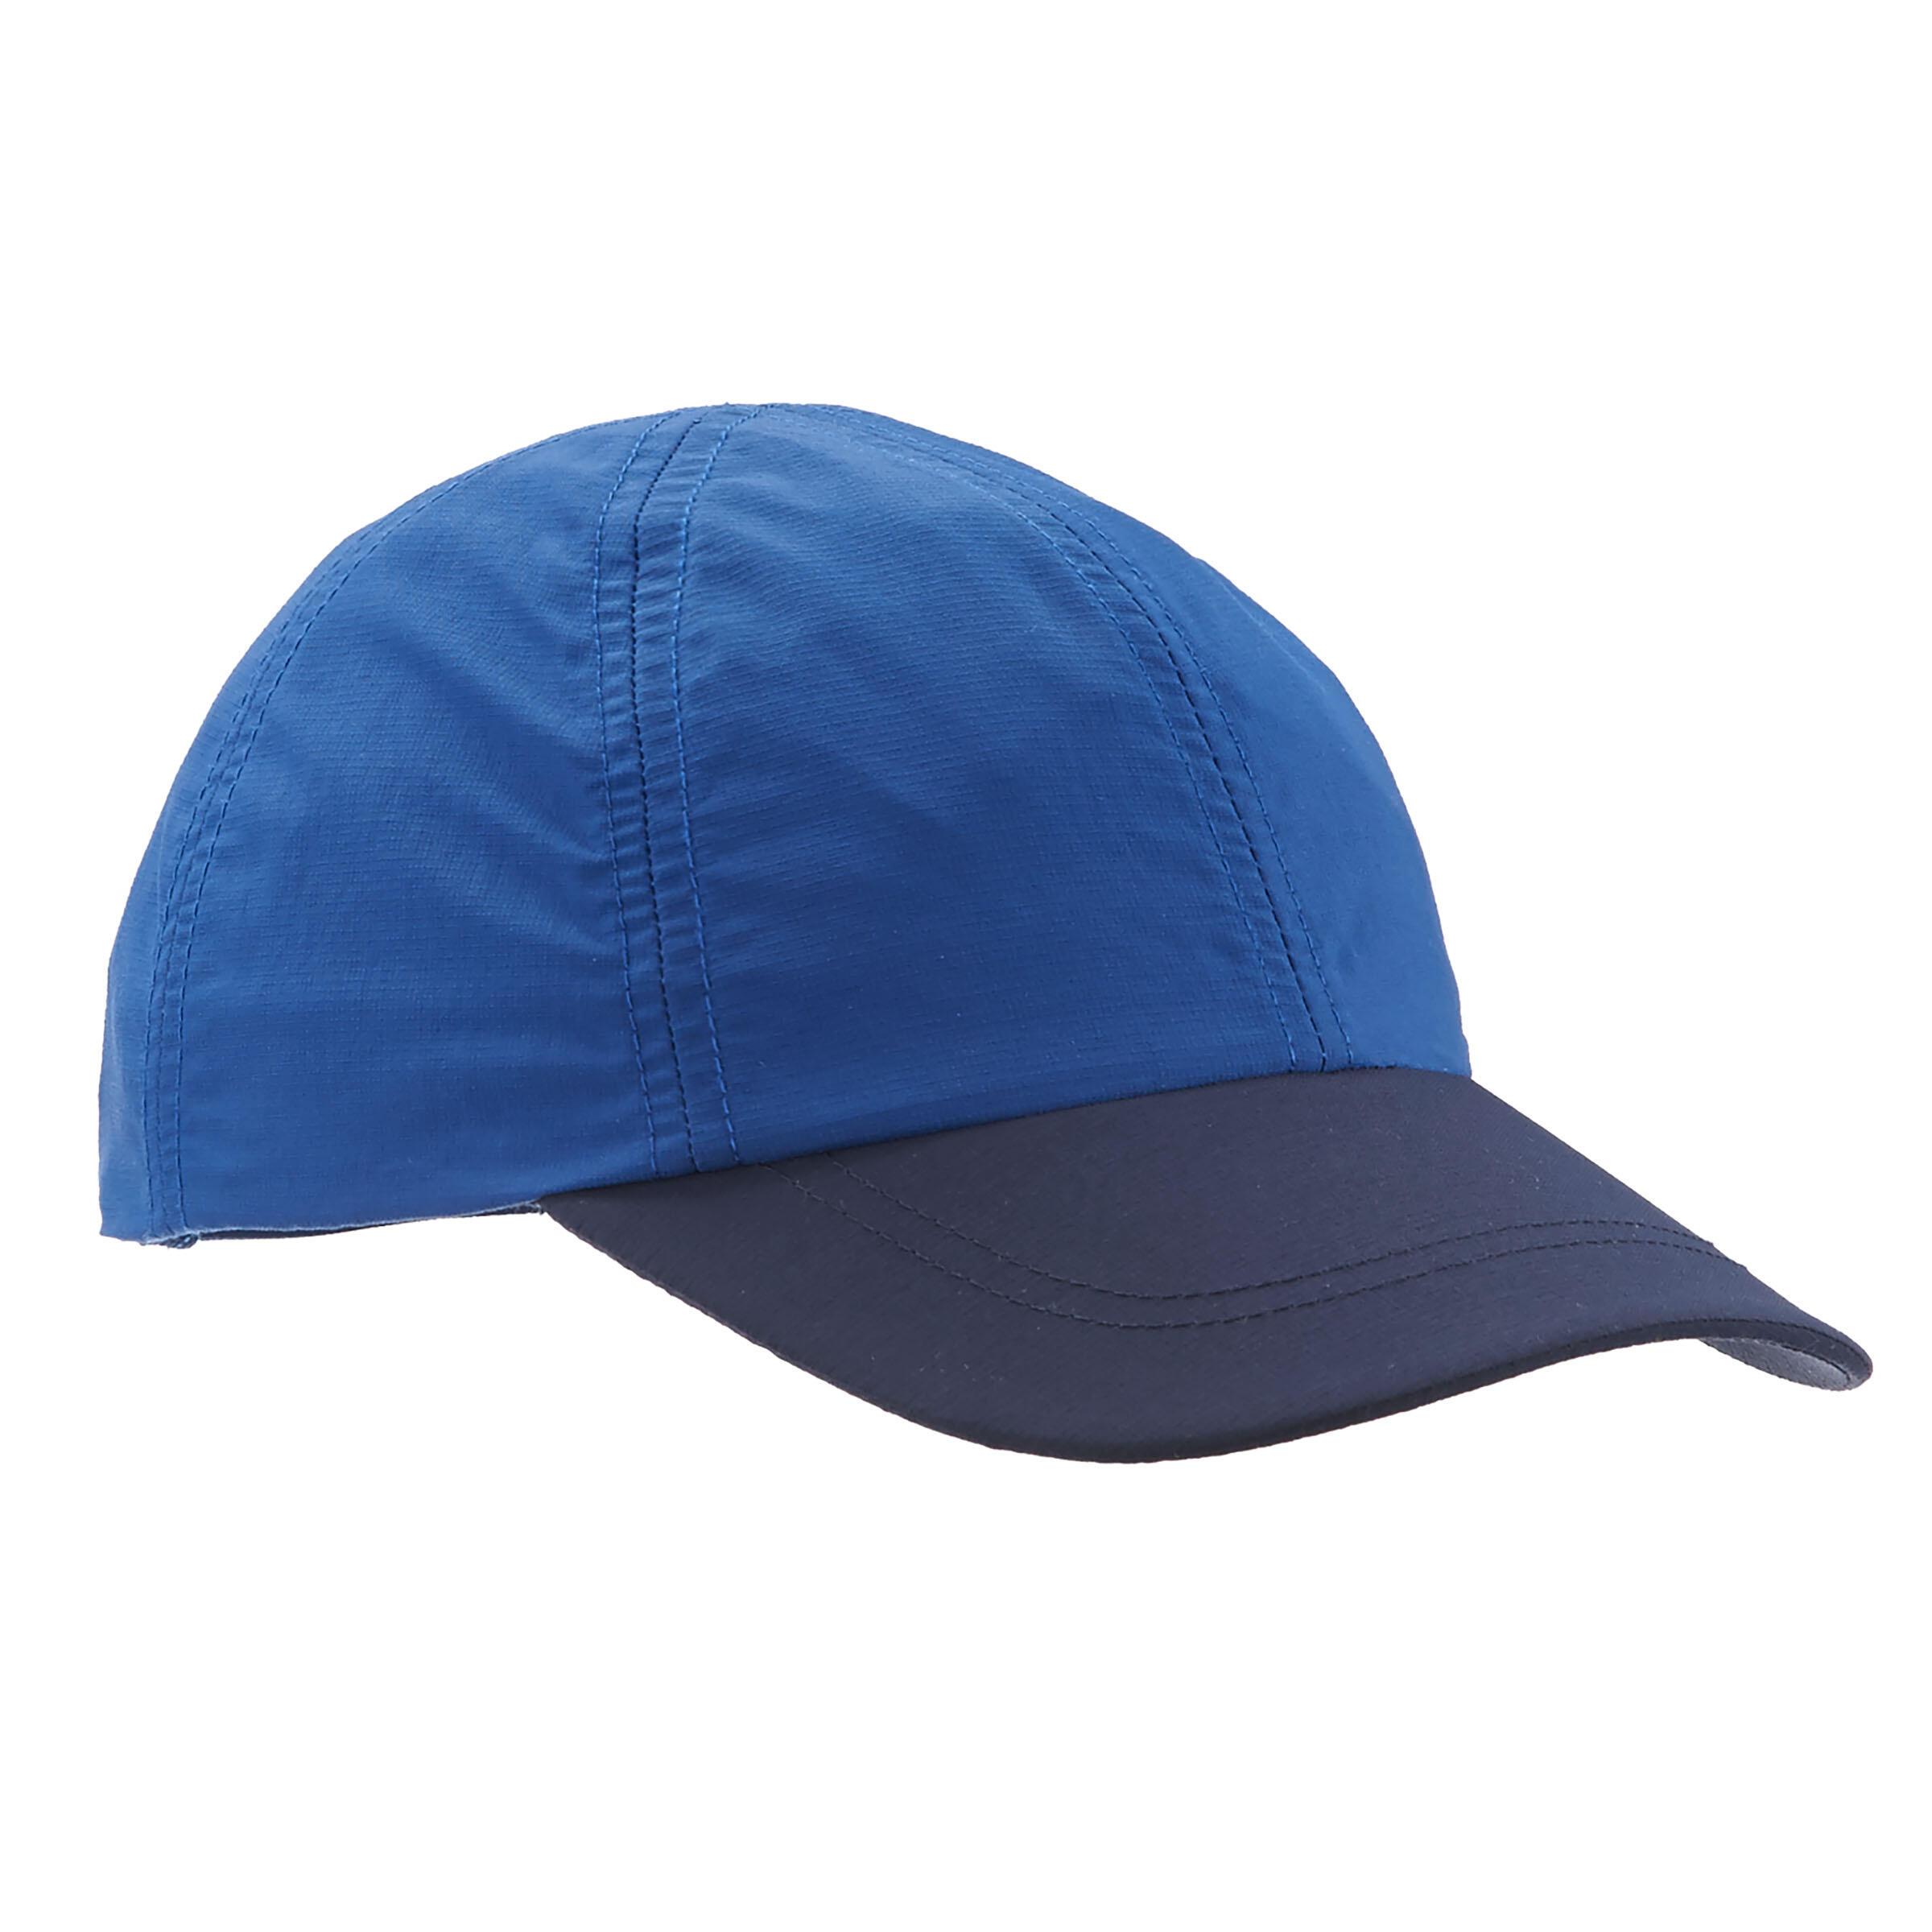 Hike 100 Boy's Hiking Hat – Blue